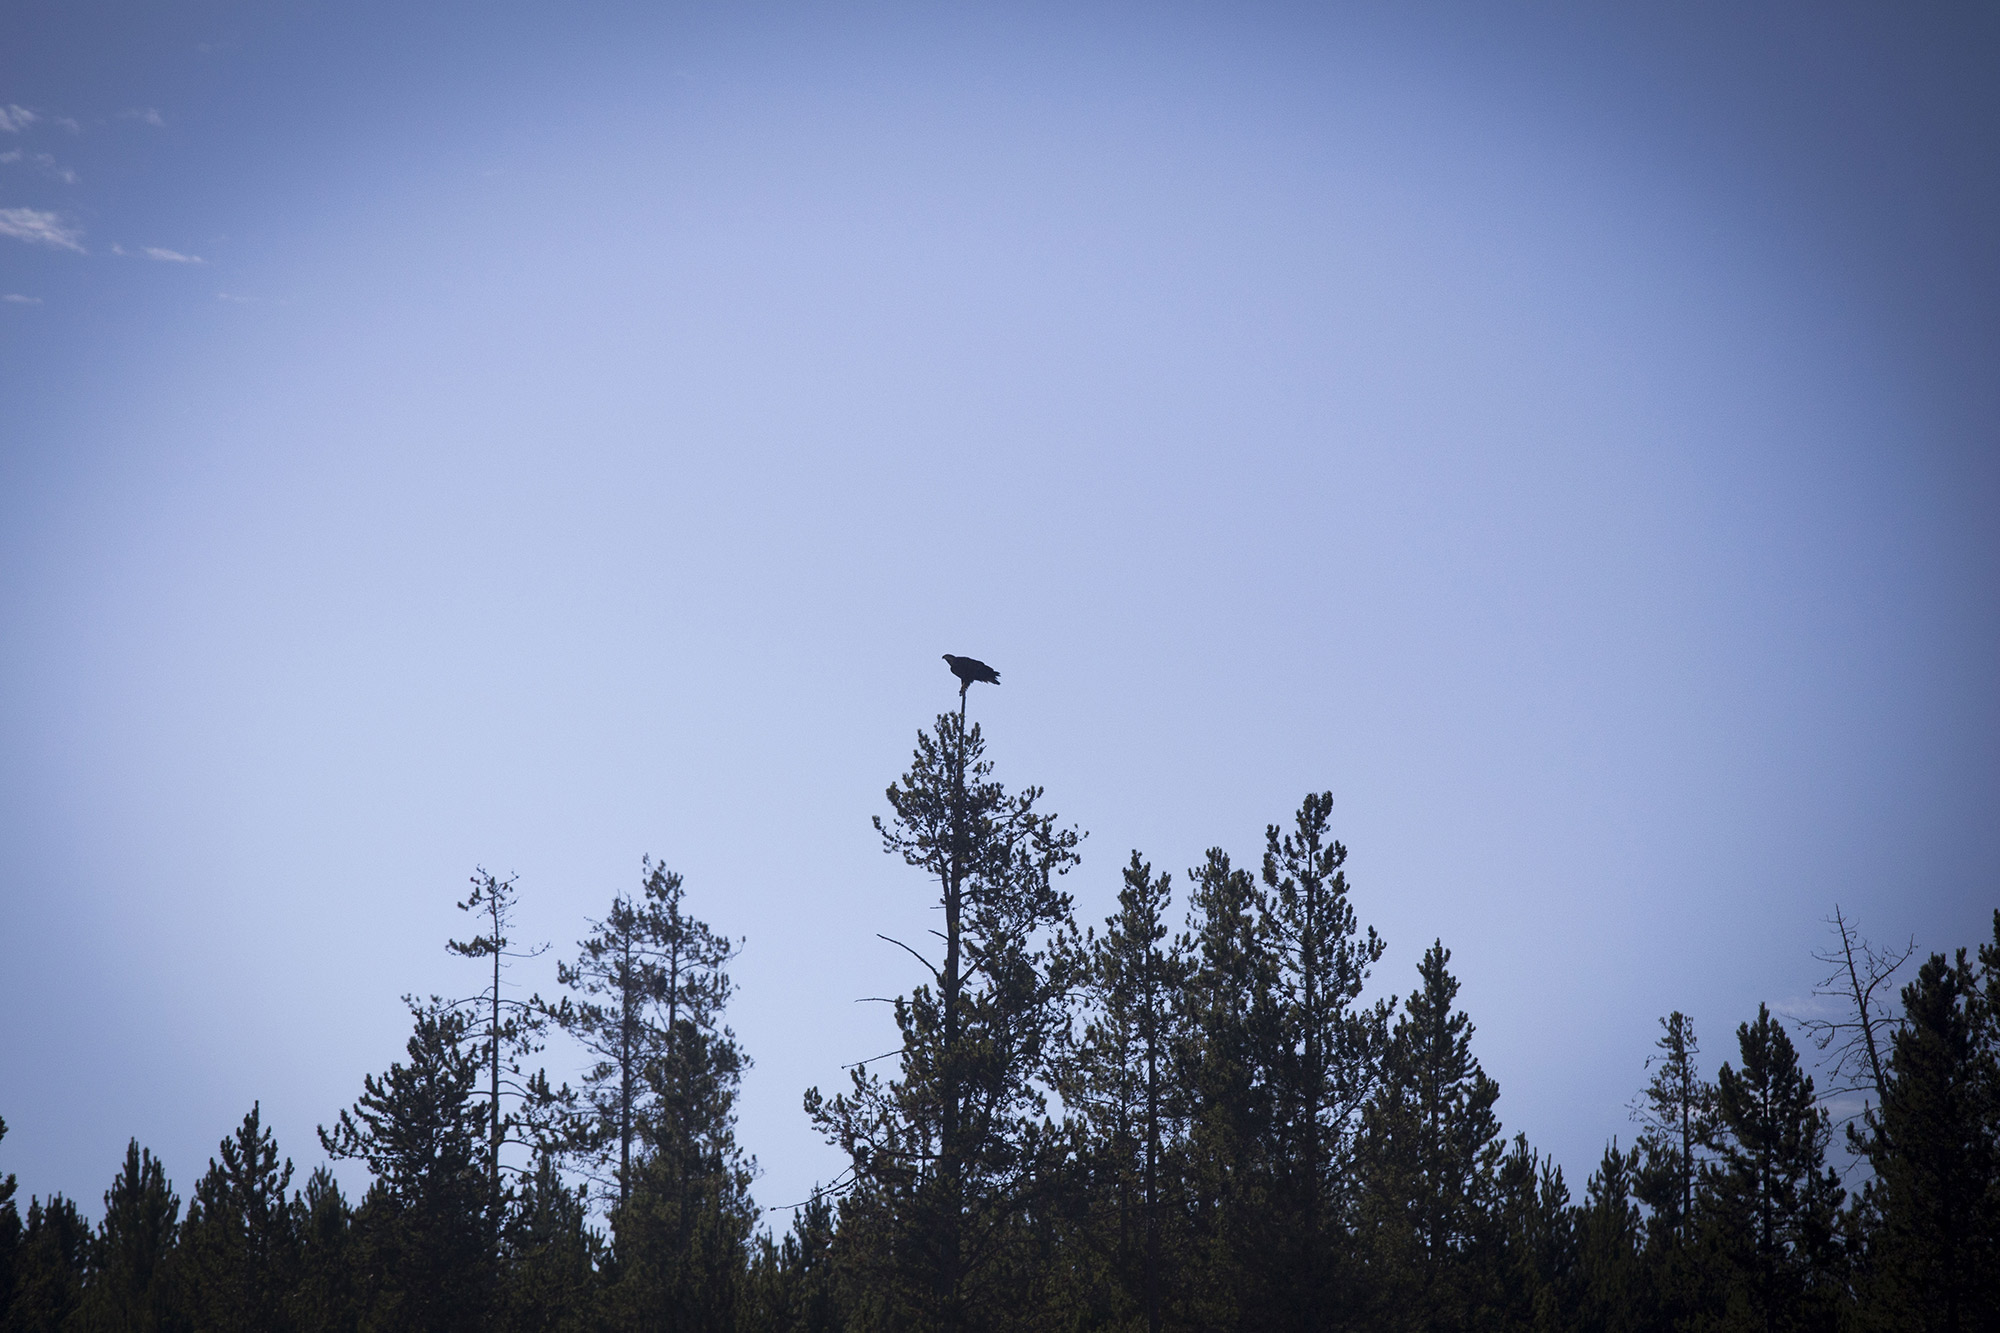 Ørnen tek ikkje unga. Foto: Even Sehested